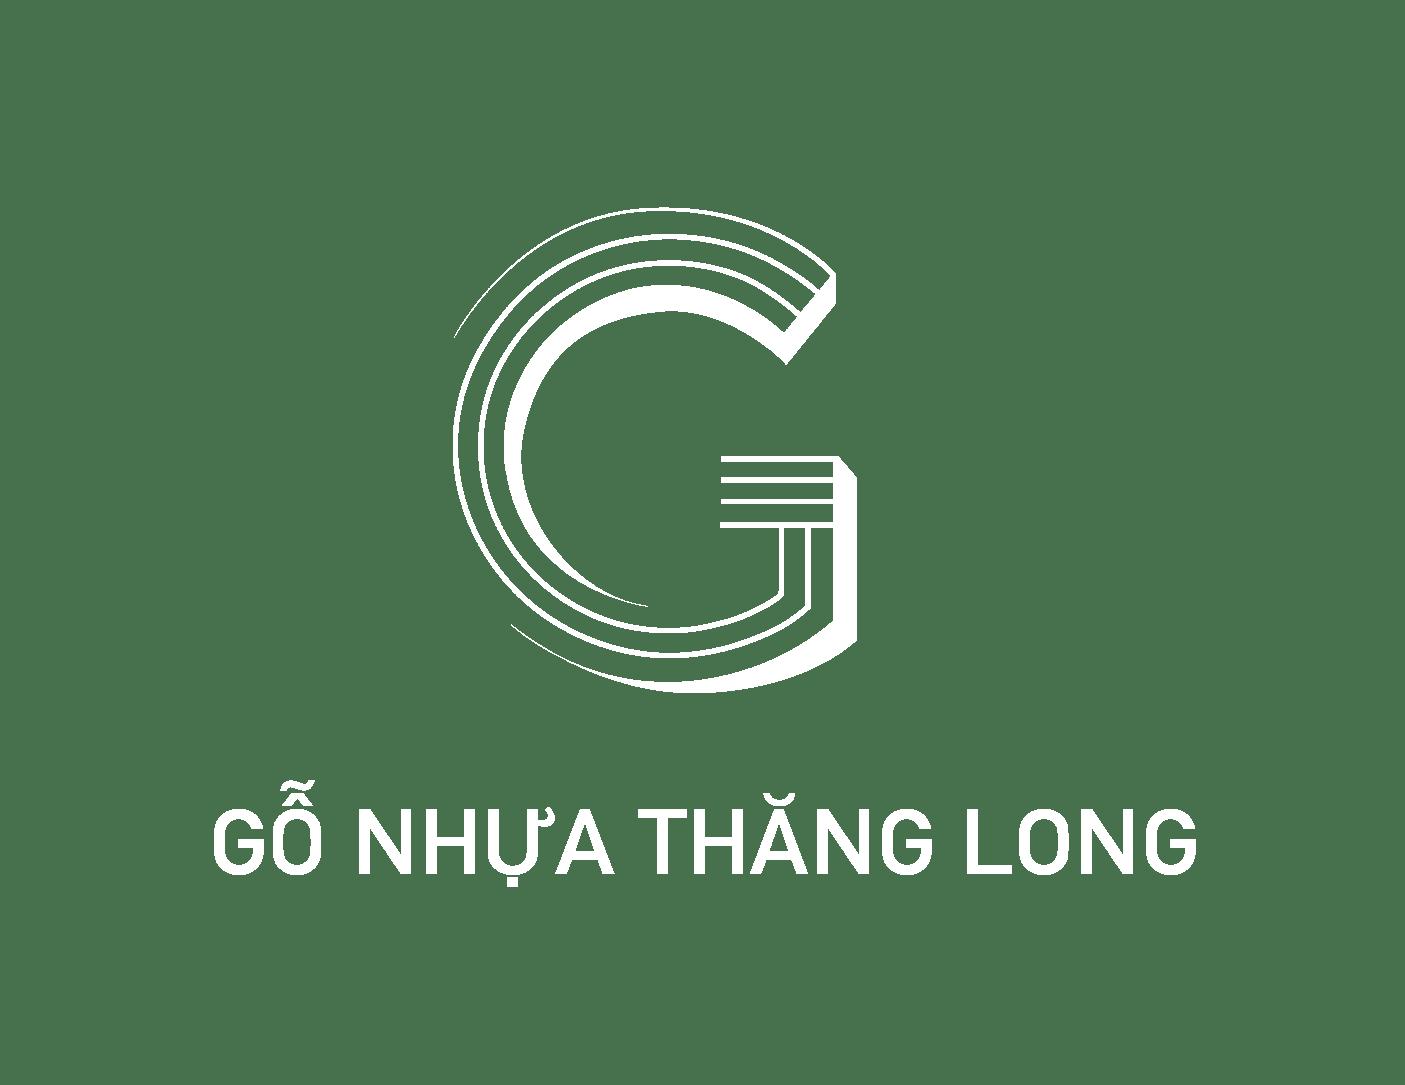 Gỗ Nhựa Thăng Long